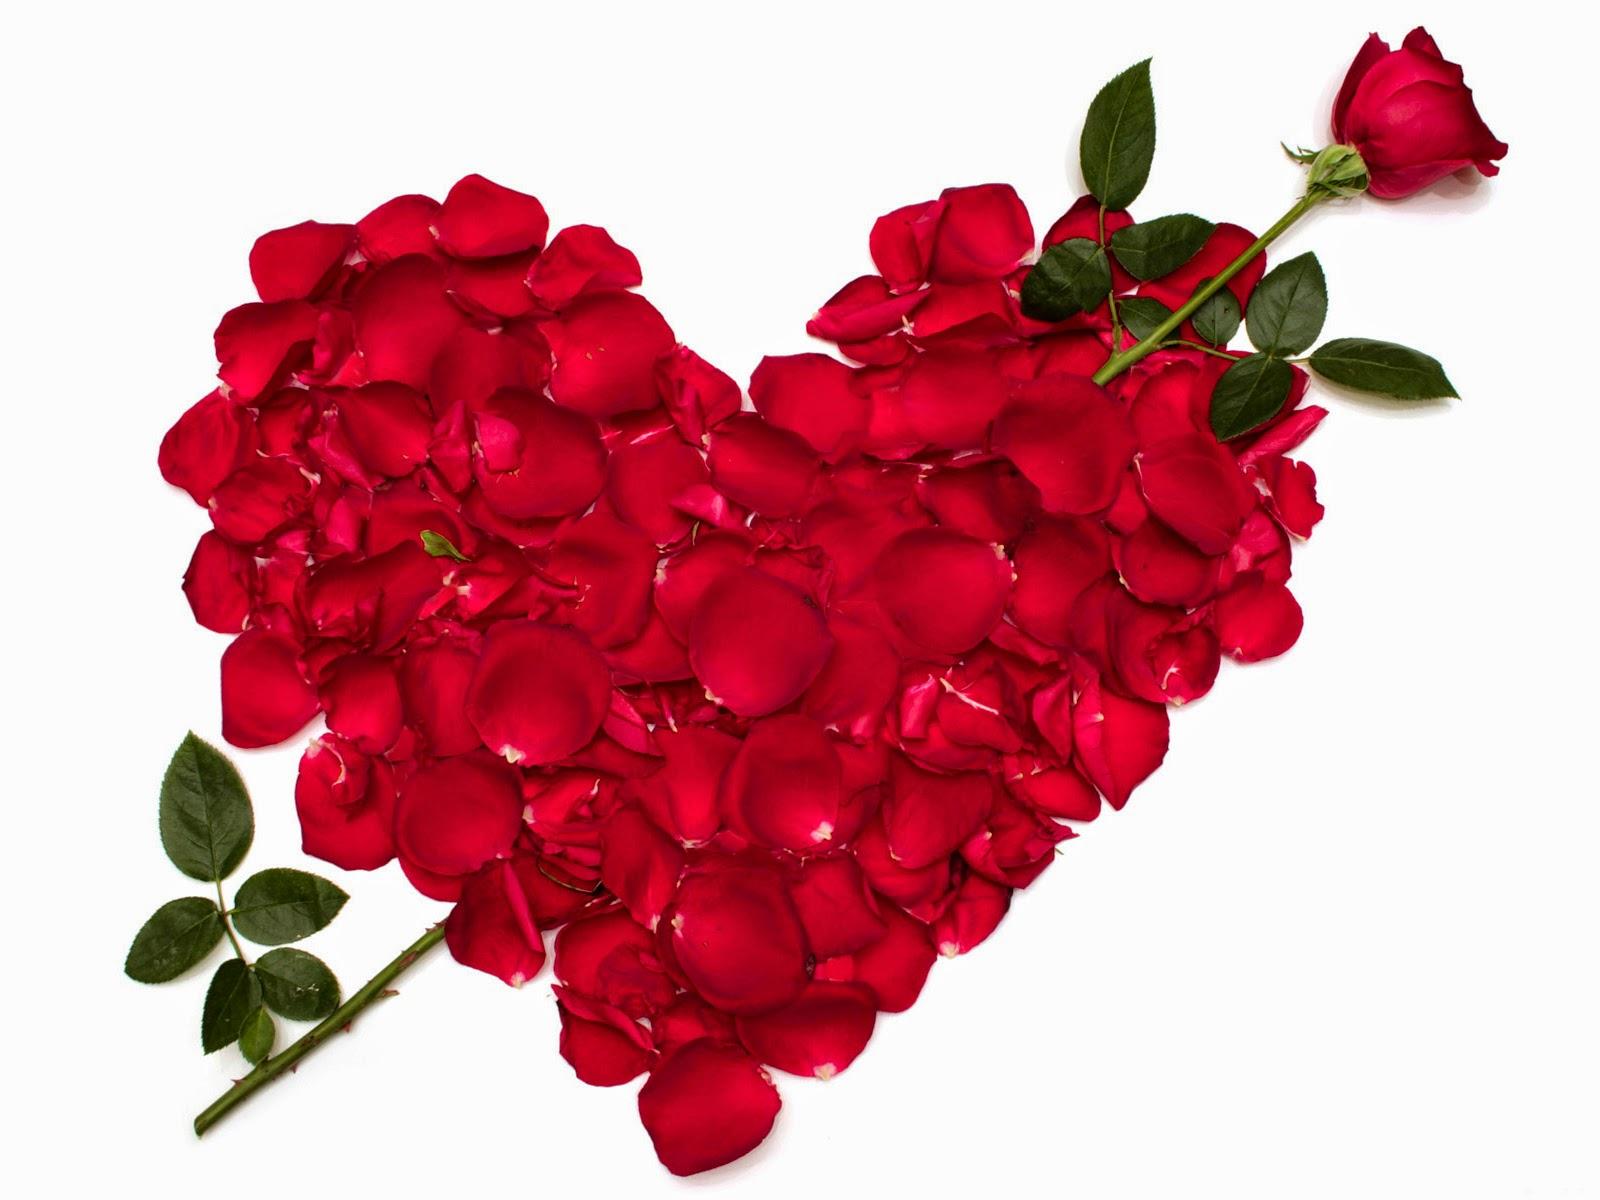 بالصور صور اجمل ورد , الورد وما يقوله فى صوره 6659 11